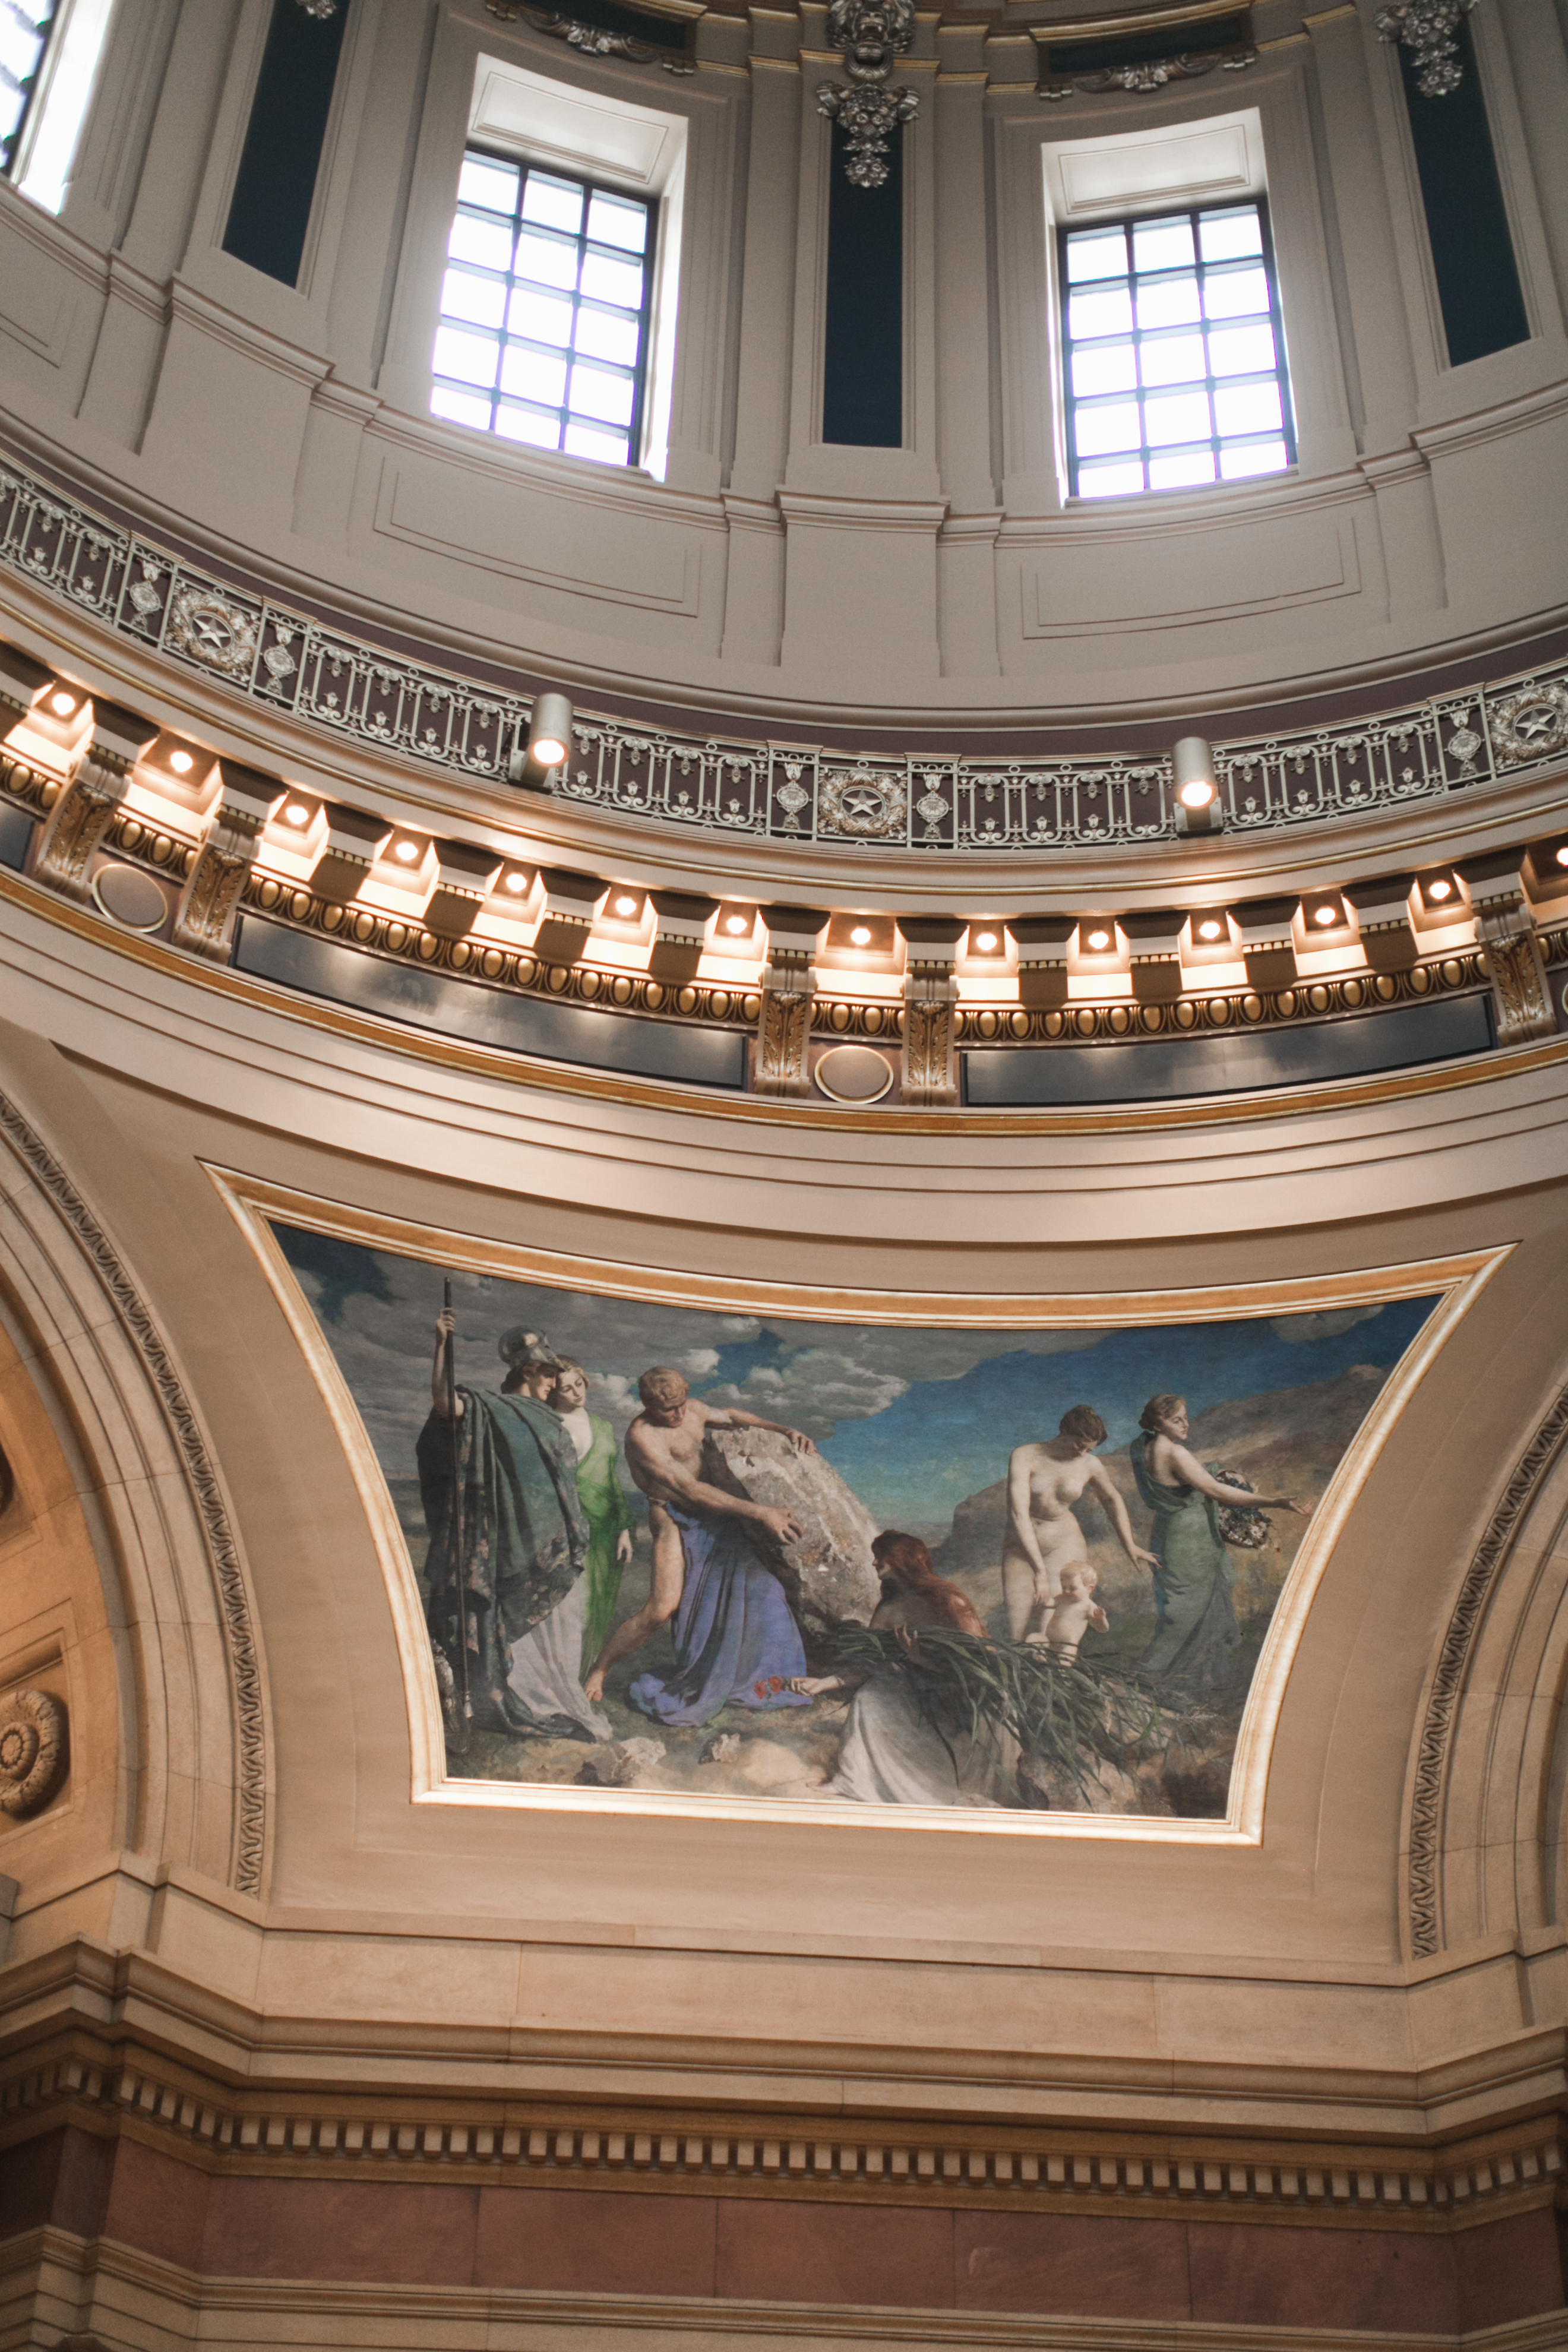 35 Years of Legislative Advances for Students